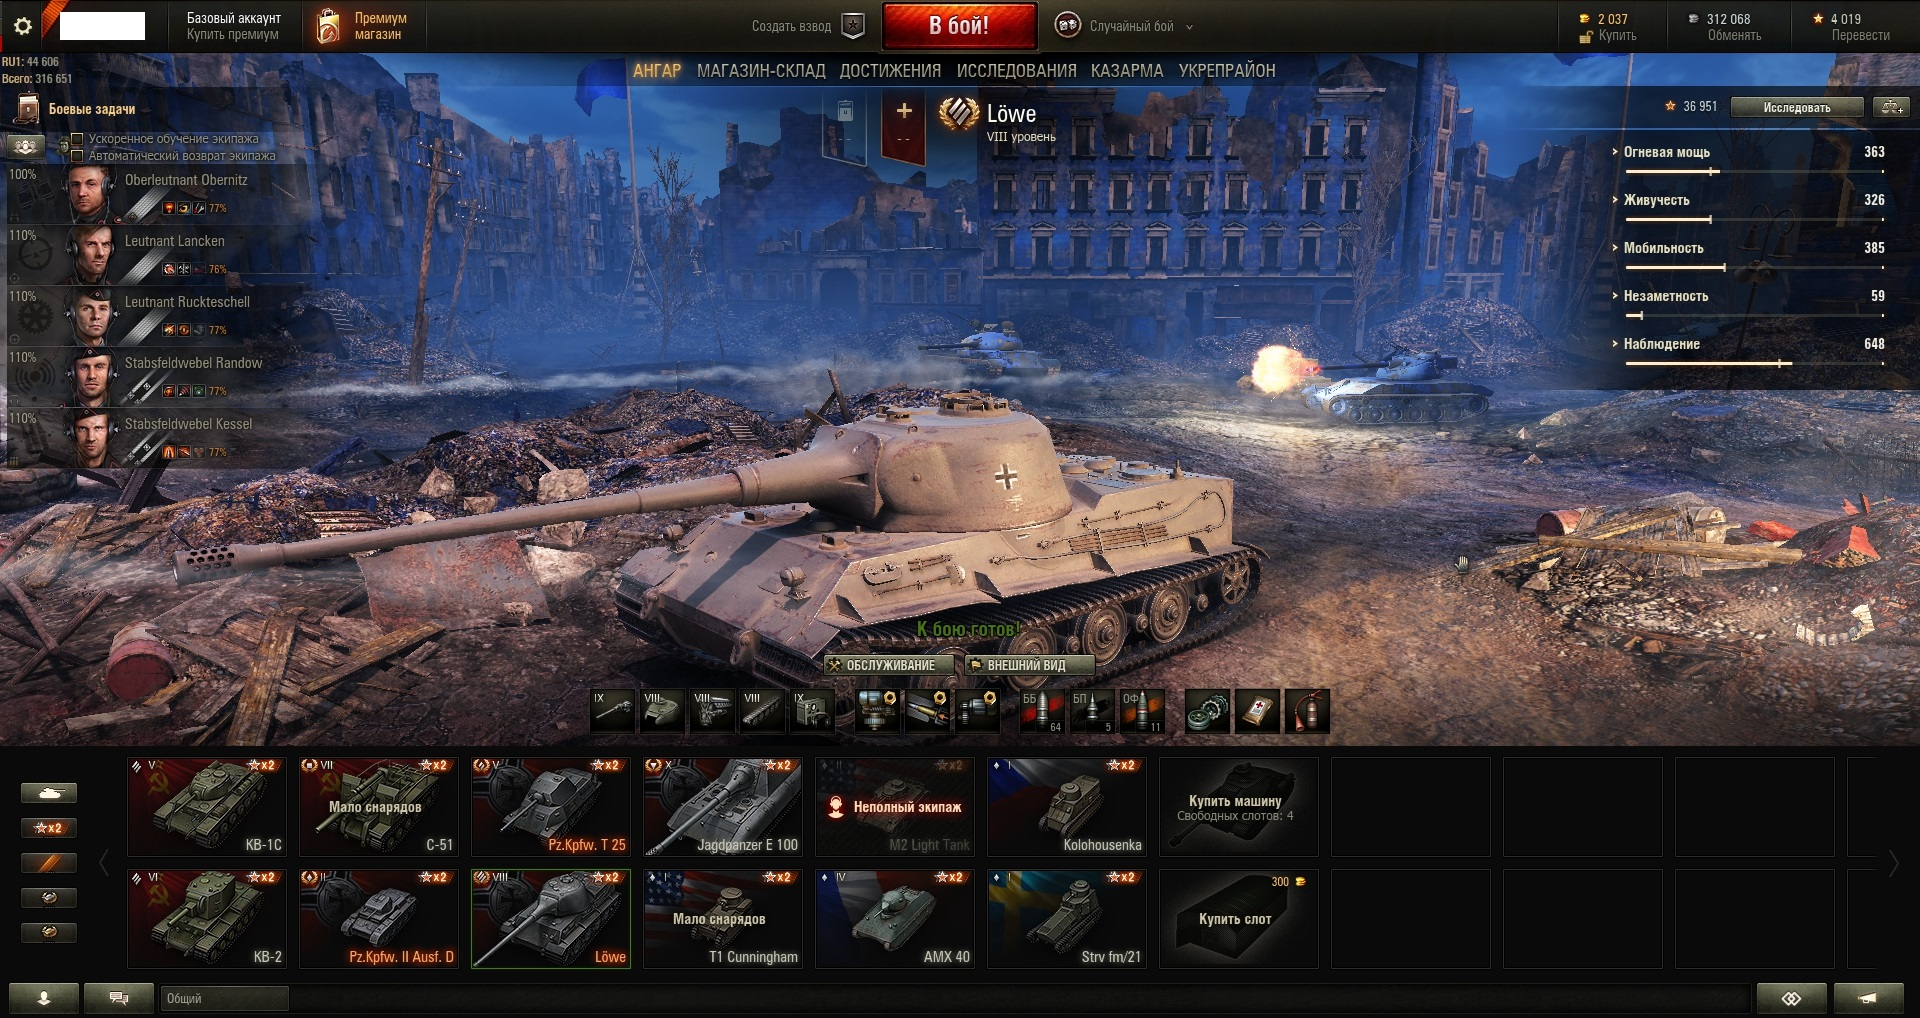 Steampay world of tanks аккаунты m4a1 s или m4a4